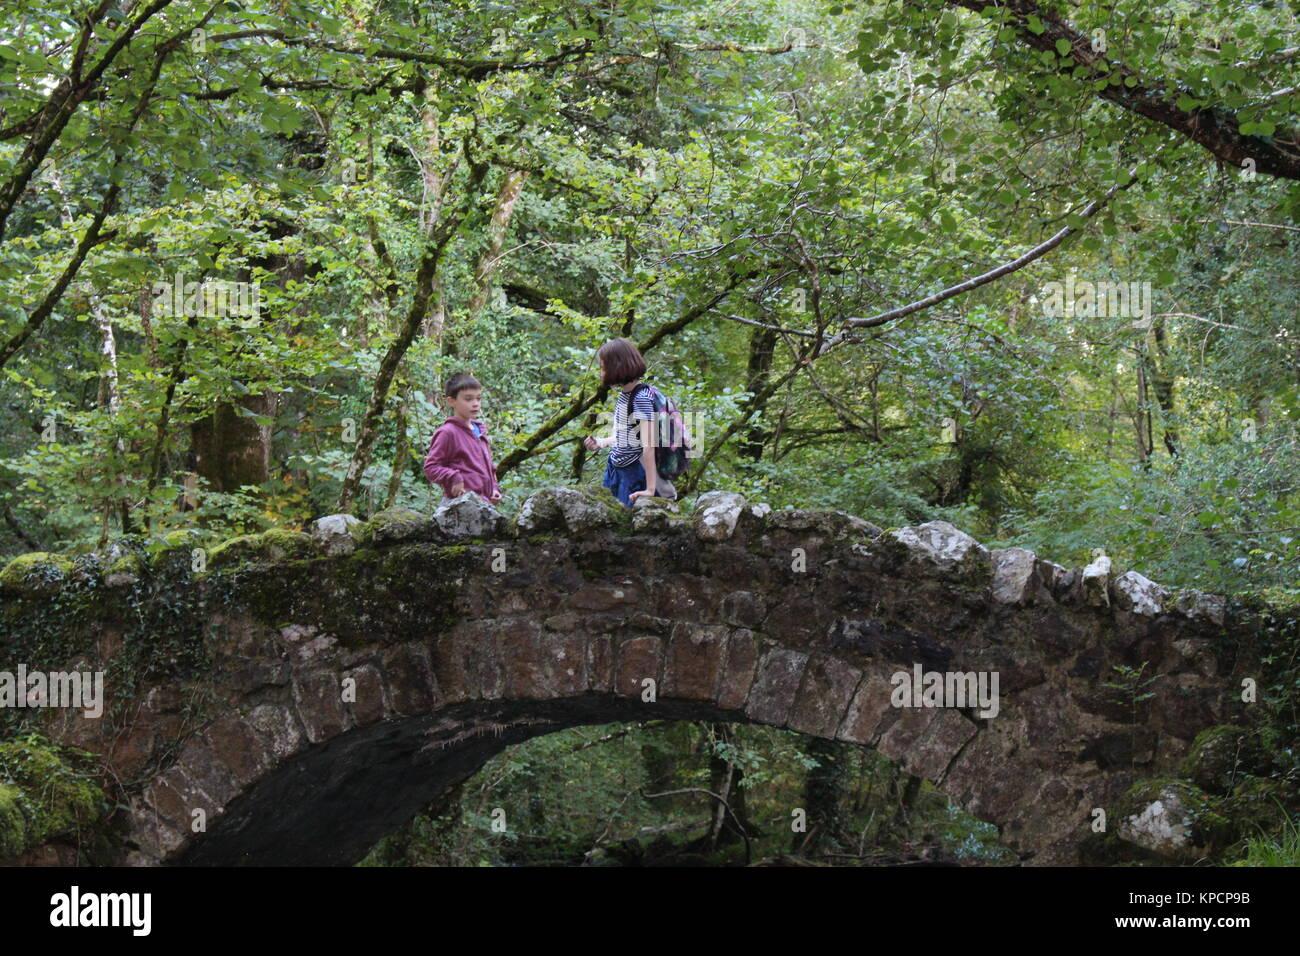 Kids on a bridge in woods, Kids outdoors, kids in woods, children in woods, children outdoors - Stock Image